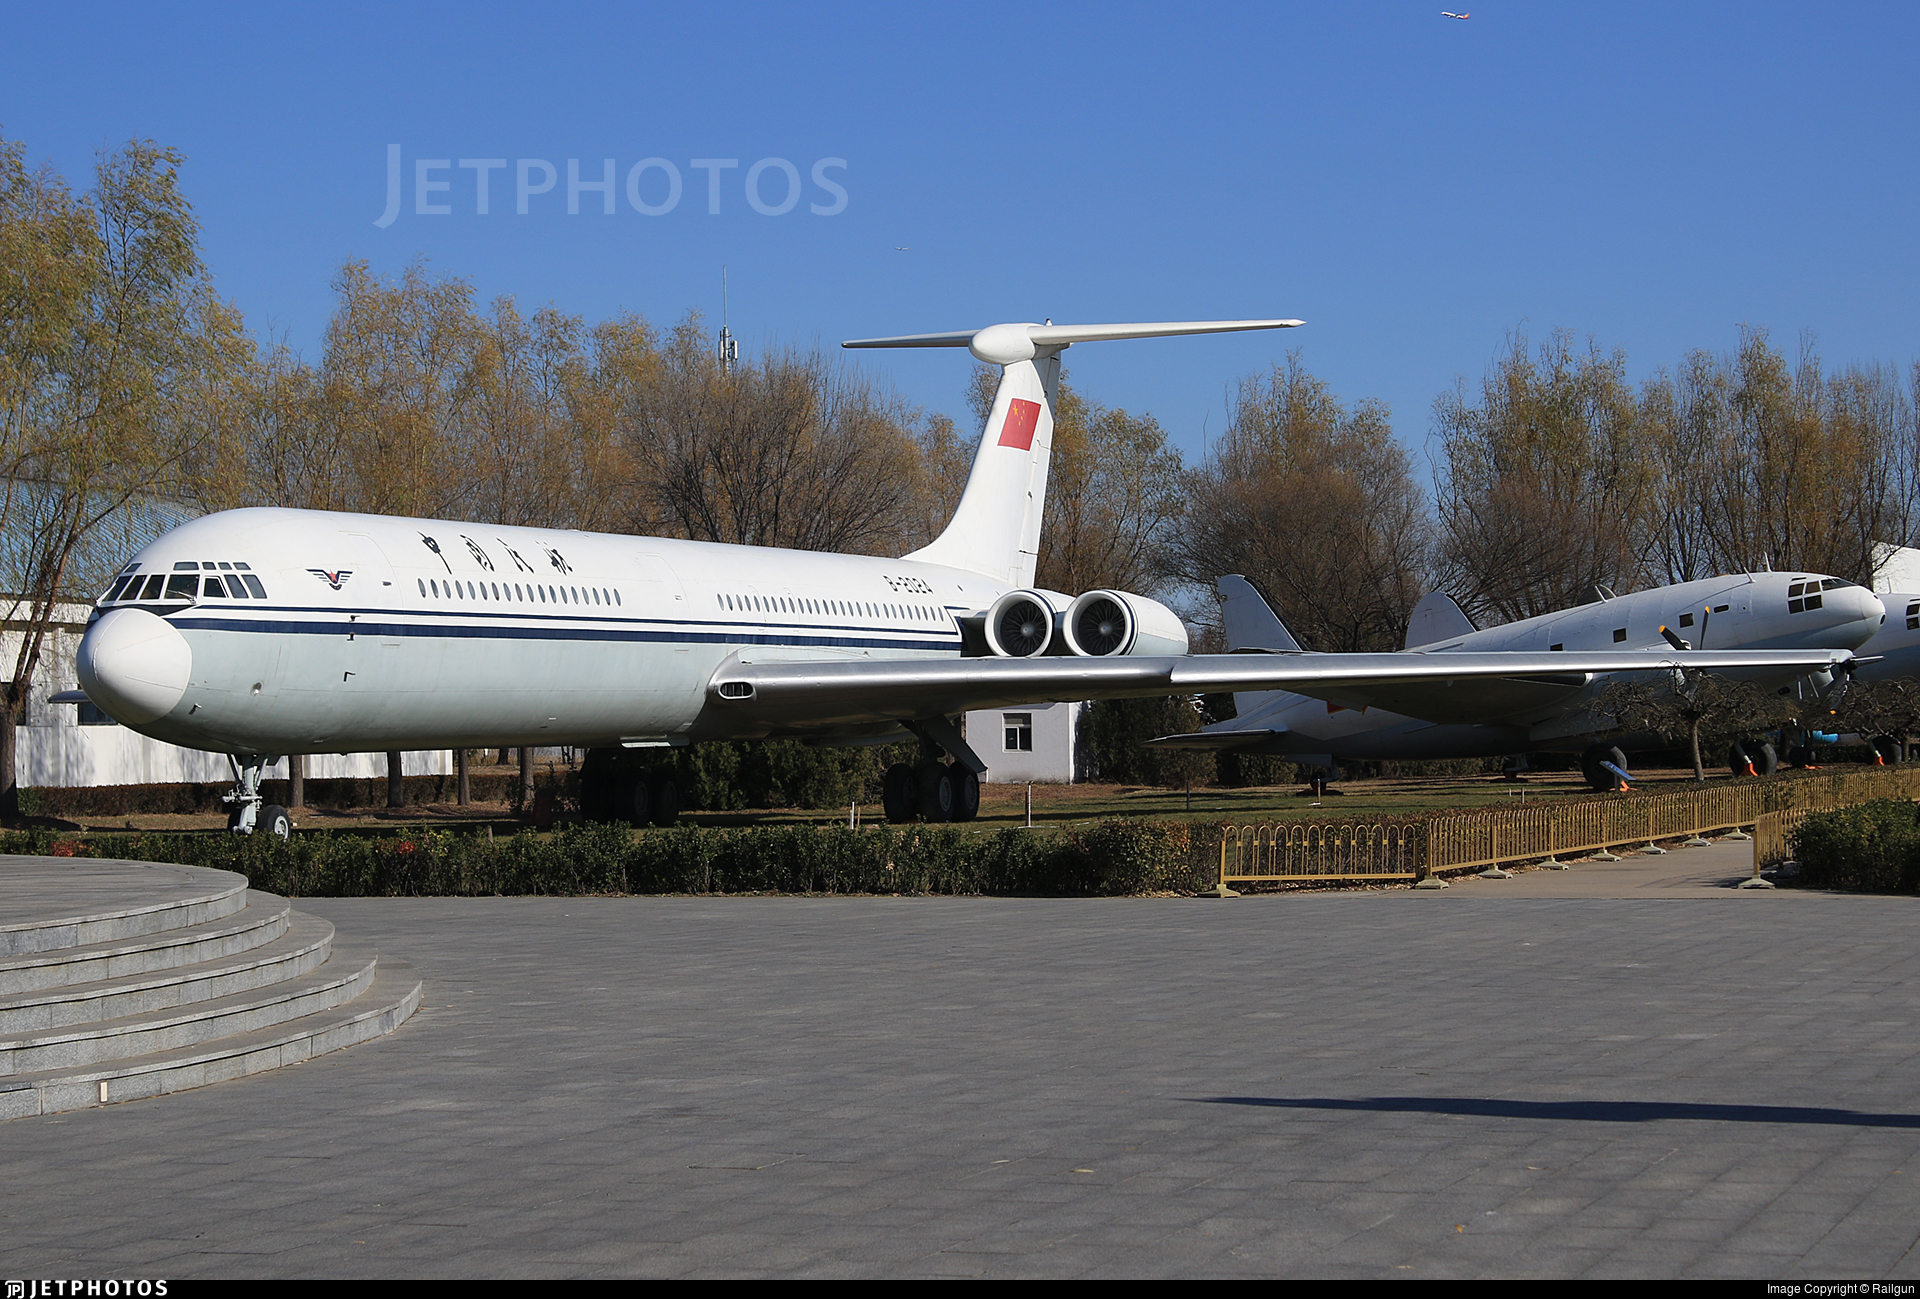 B-2024 - Ilyushin IL-62 - Civil Aviation Administration of China (CAAC)